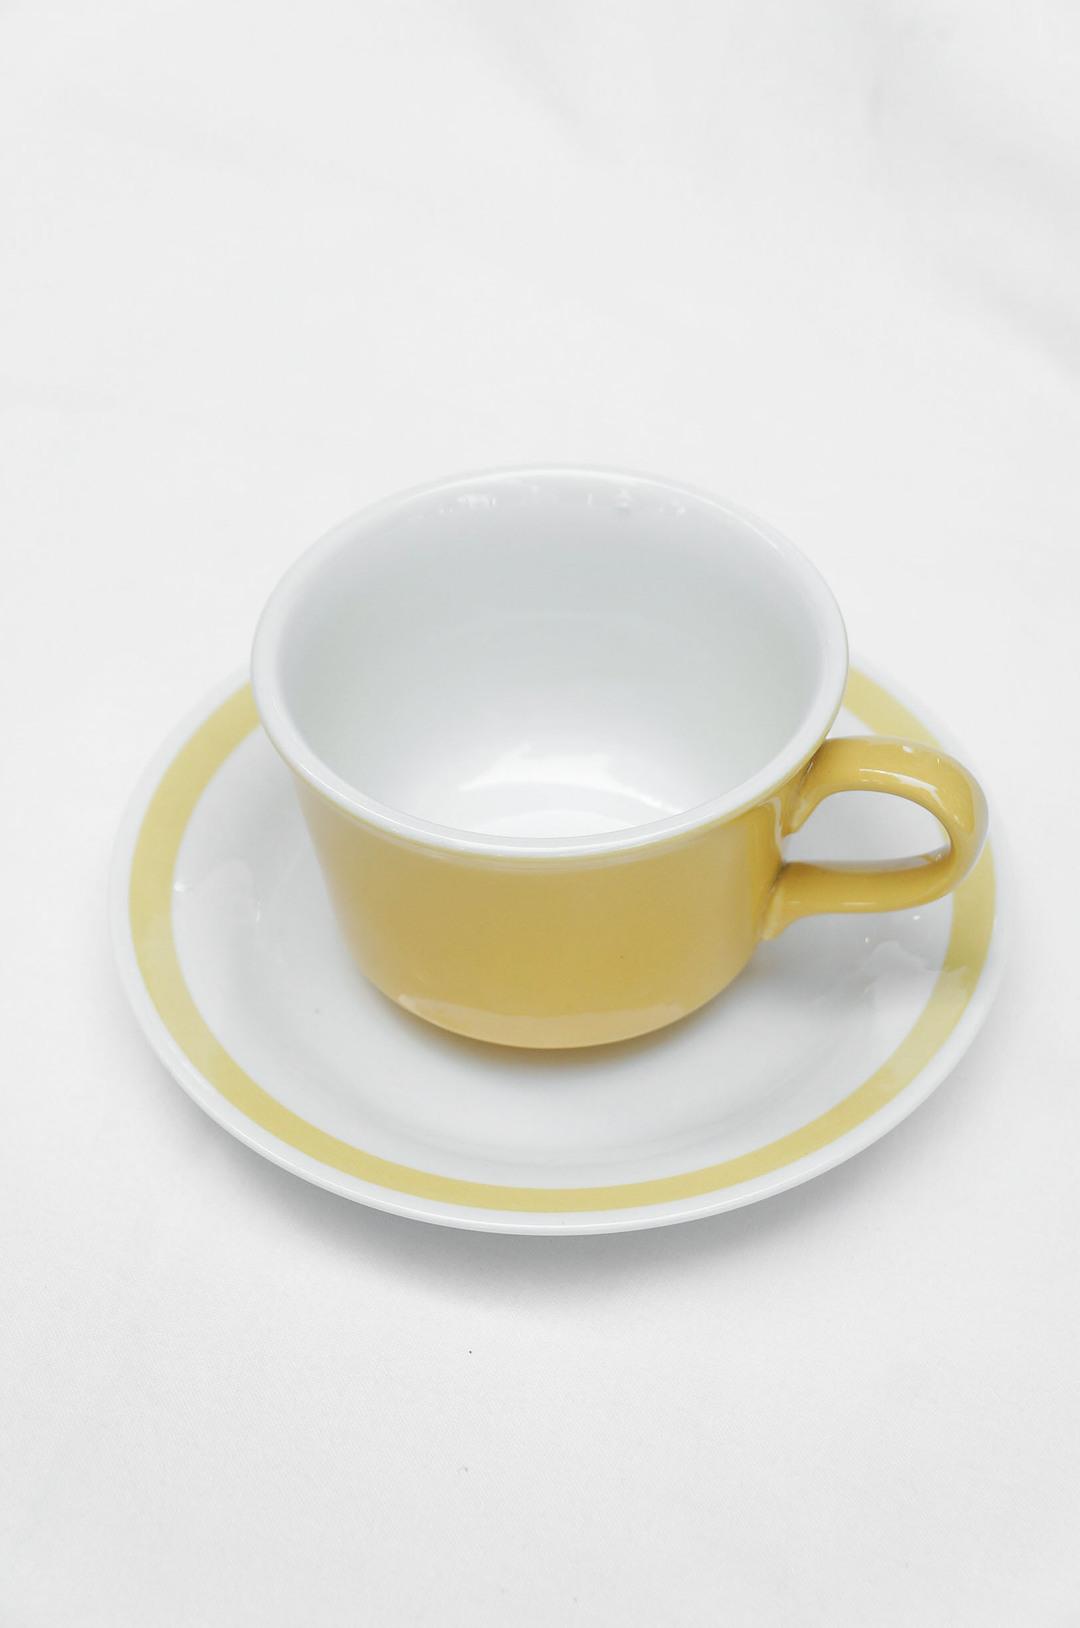 US Vintage Royal China Damsel Cup and Saucer/アメリカ ヴィンテージ ロイヤルチャイナ ダムセル カップ&ソーサー 食器 レトロ 5